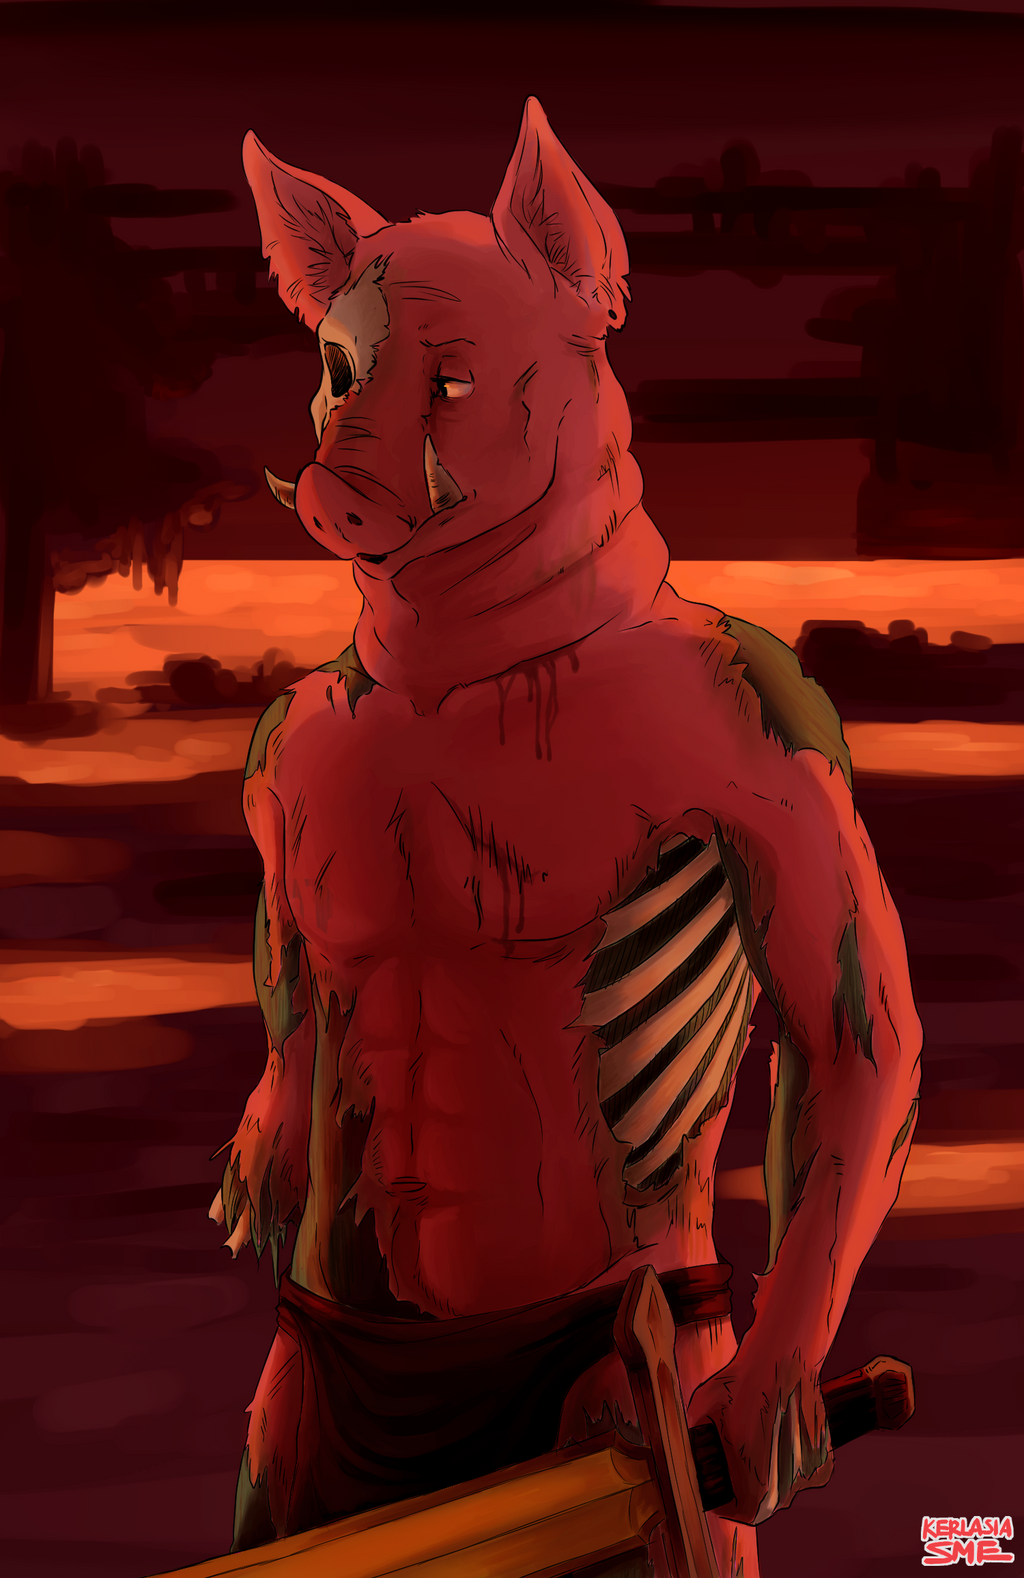 Zombie Pigman (2014) by Kerlasia on DeviantArt